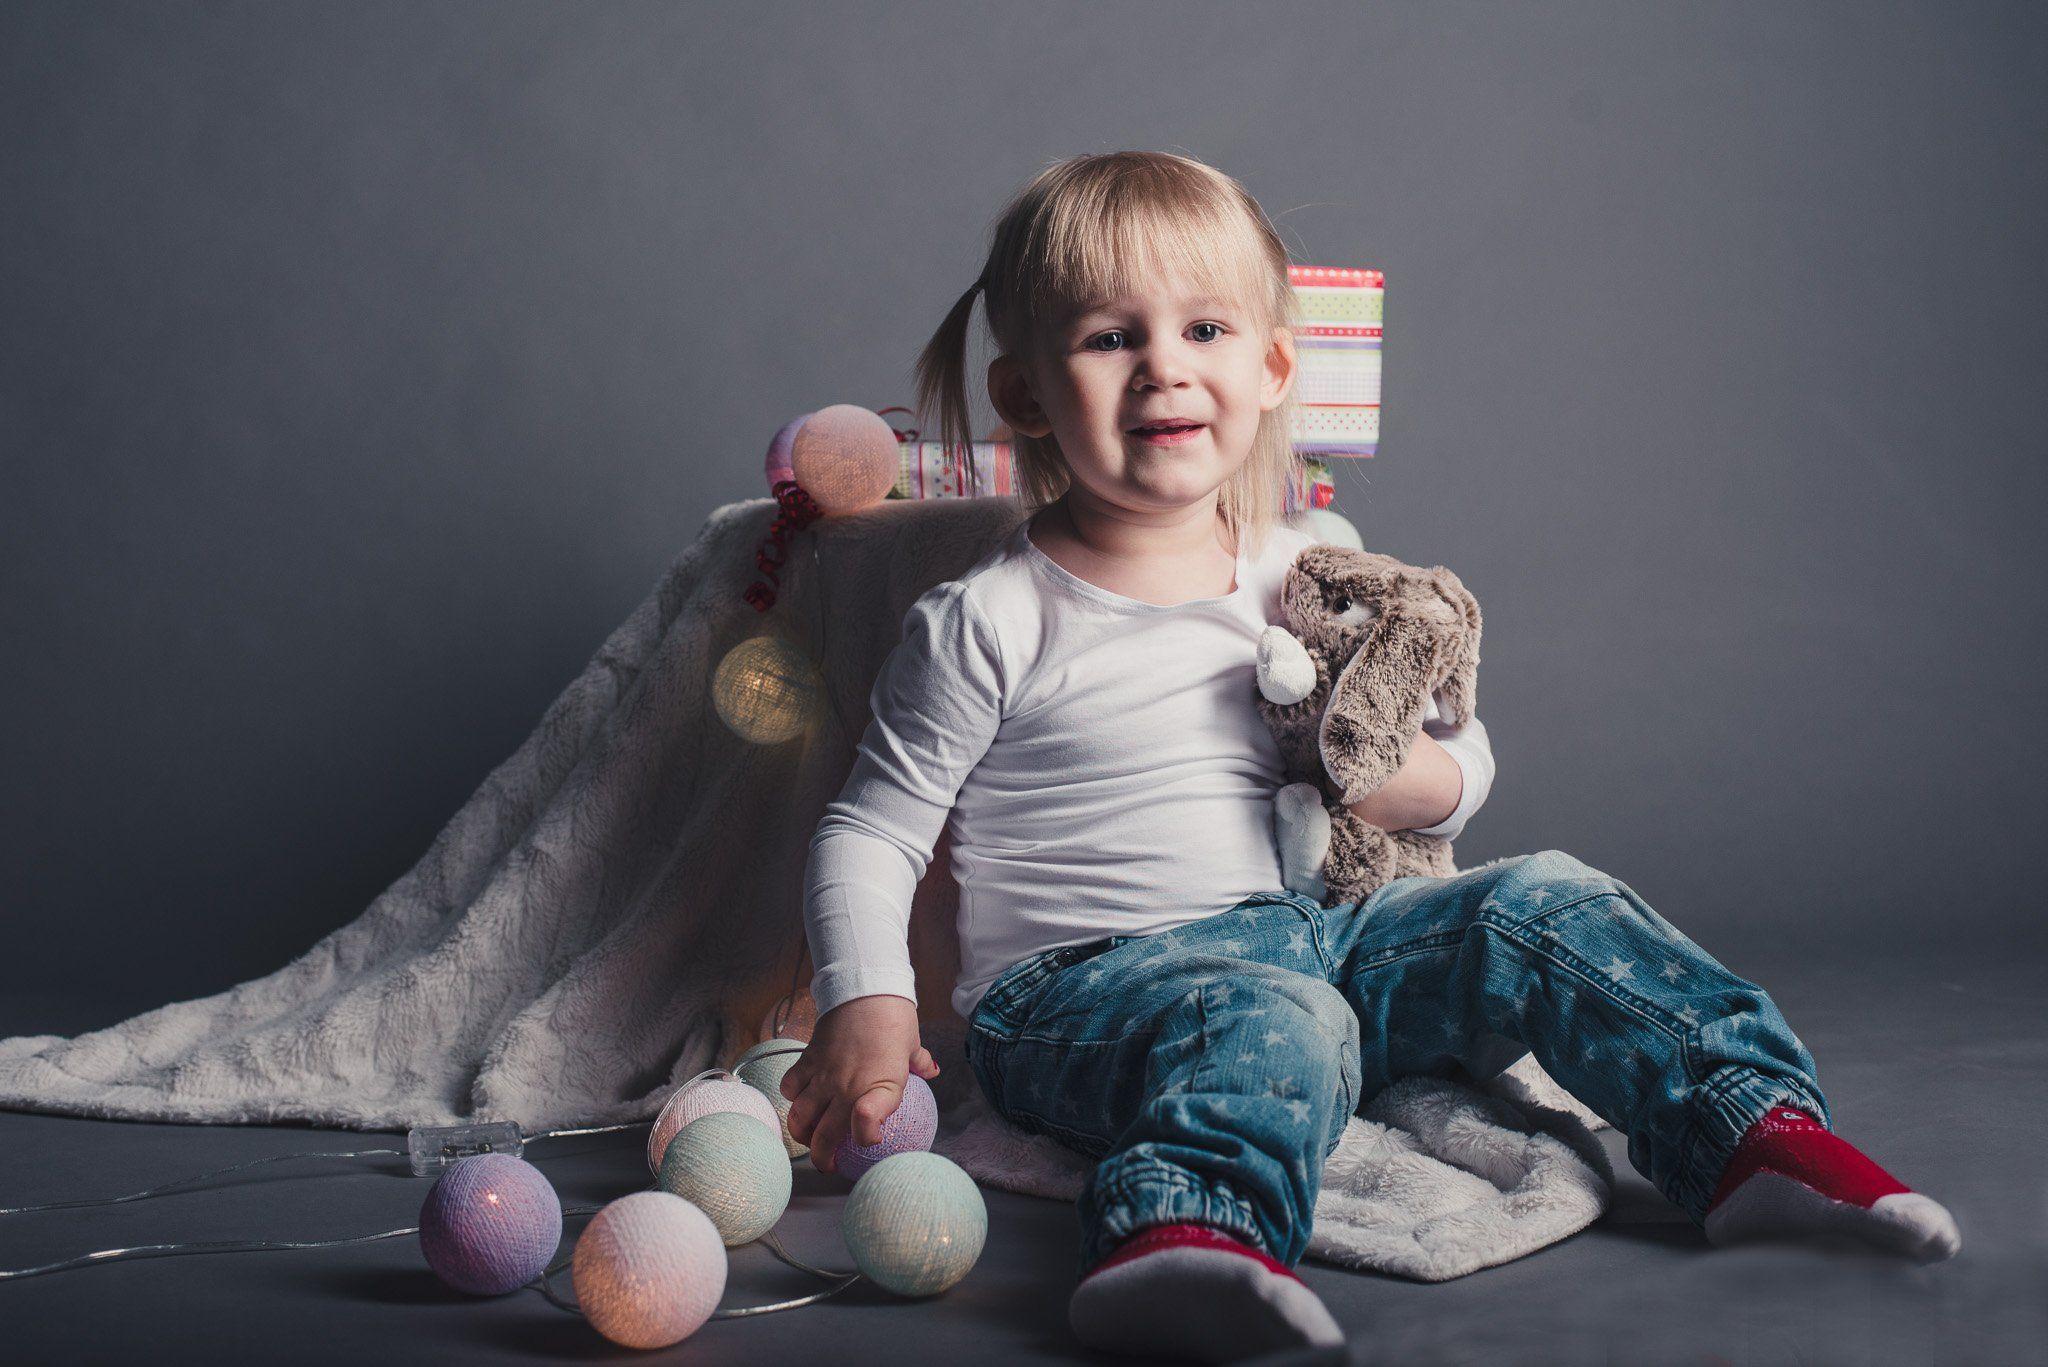 lapsikuvaus-studiokuvaus-Sanni ja jänispehmolelu studiolla